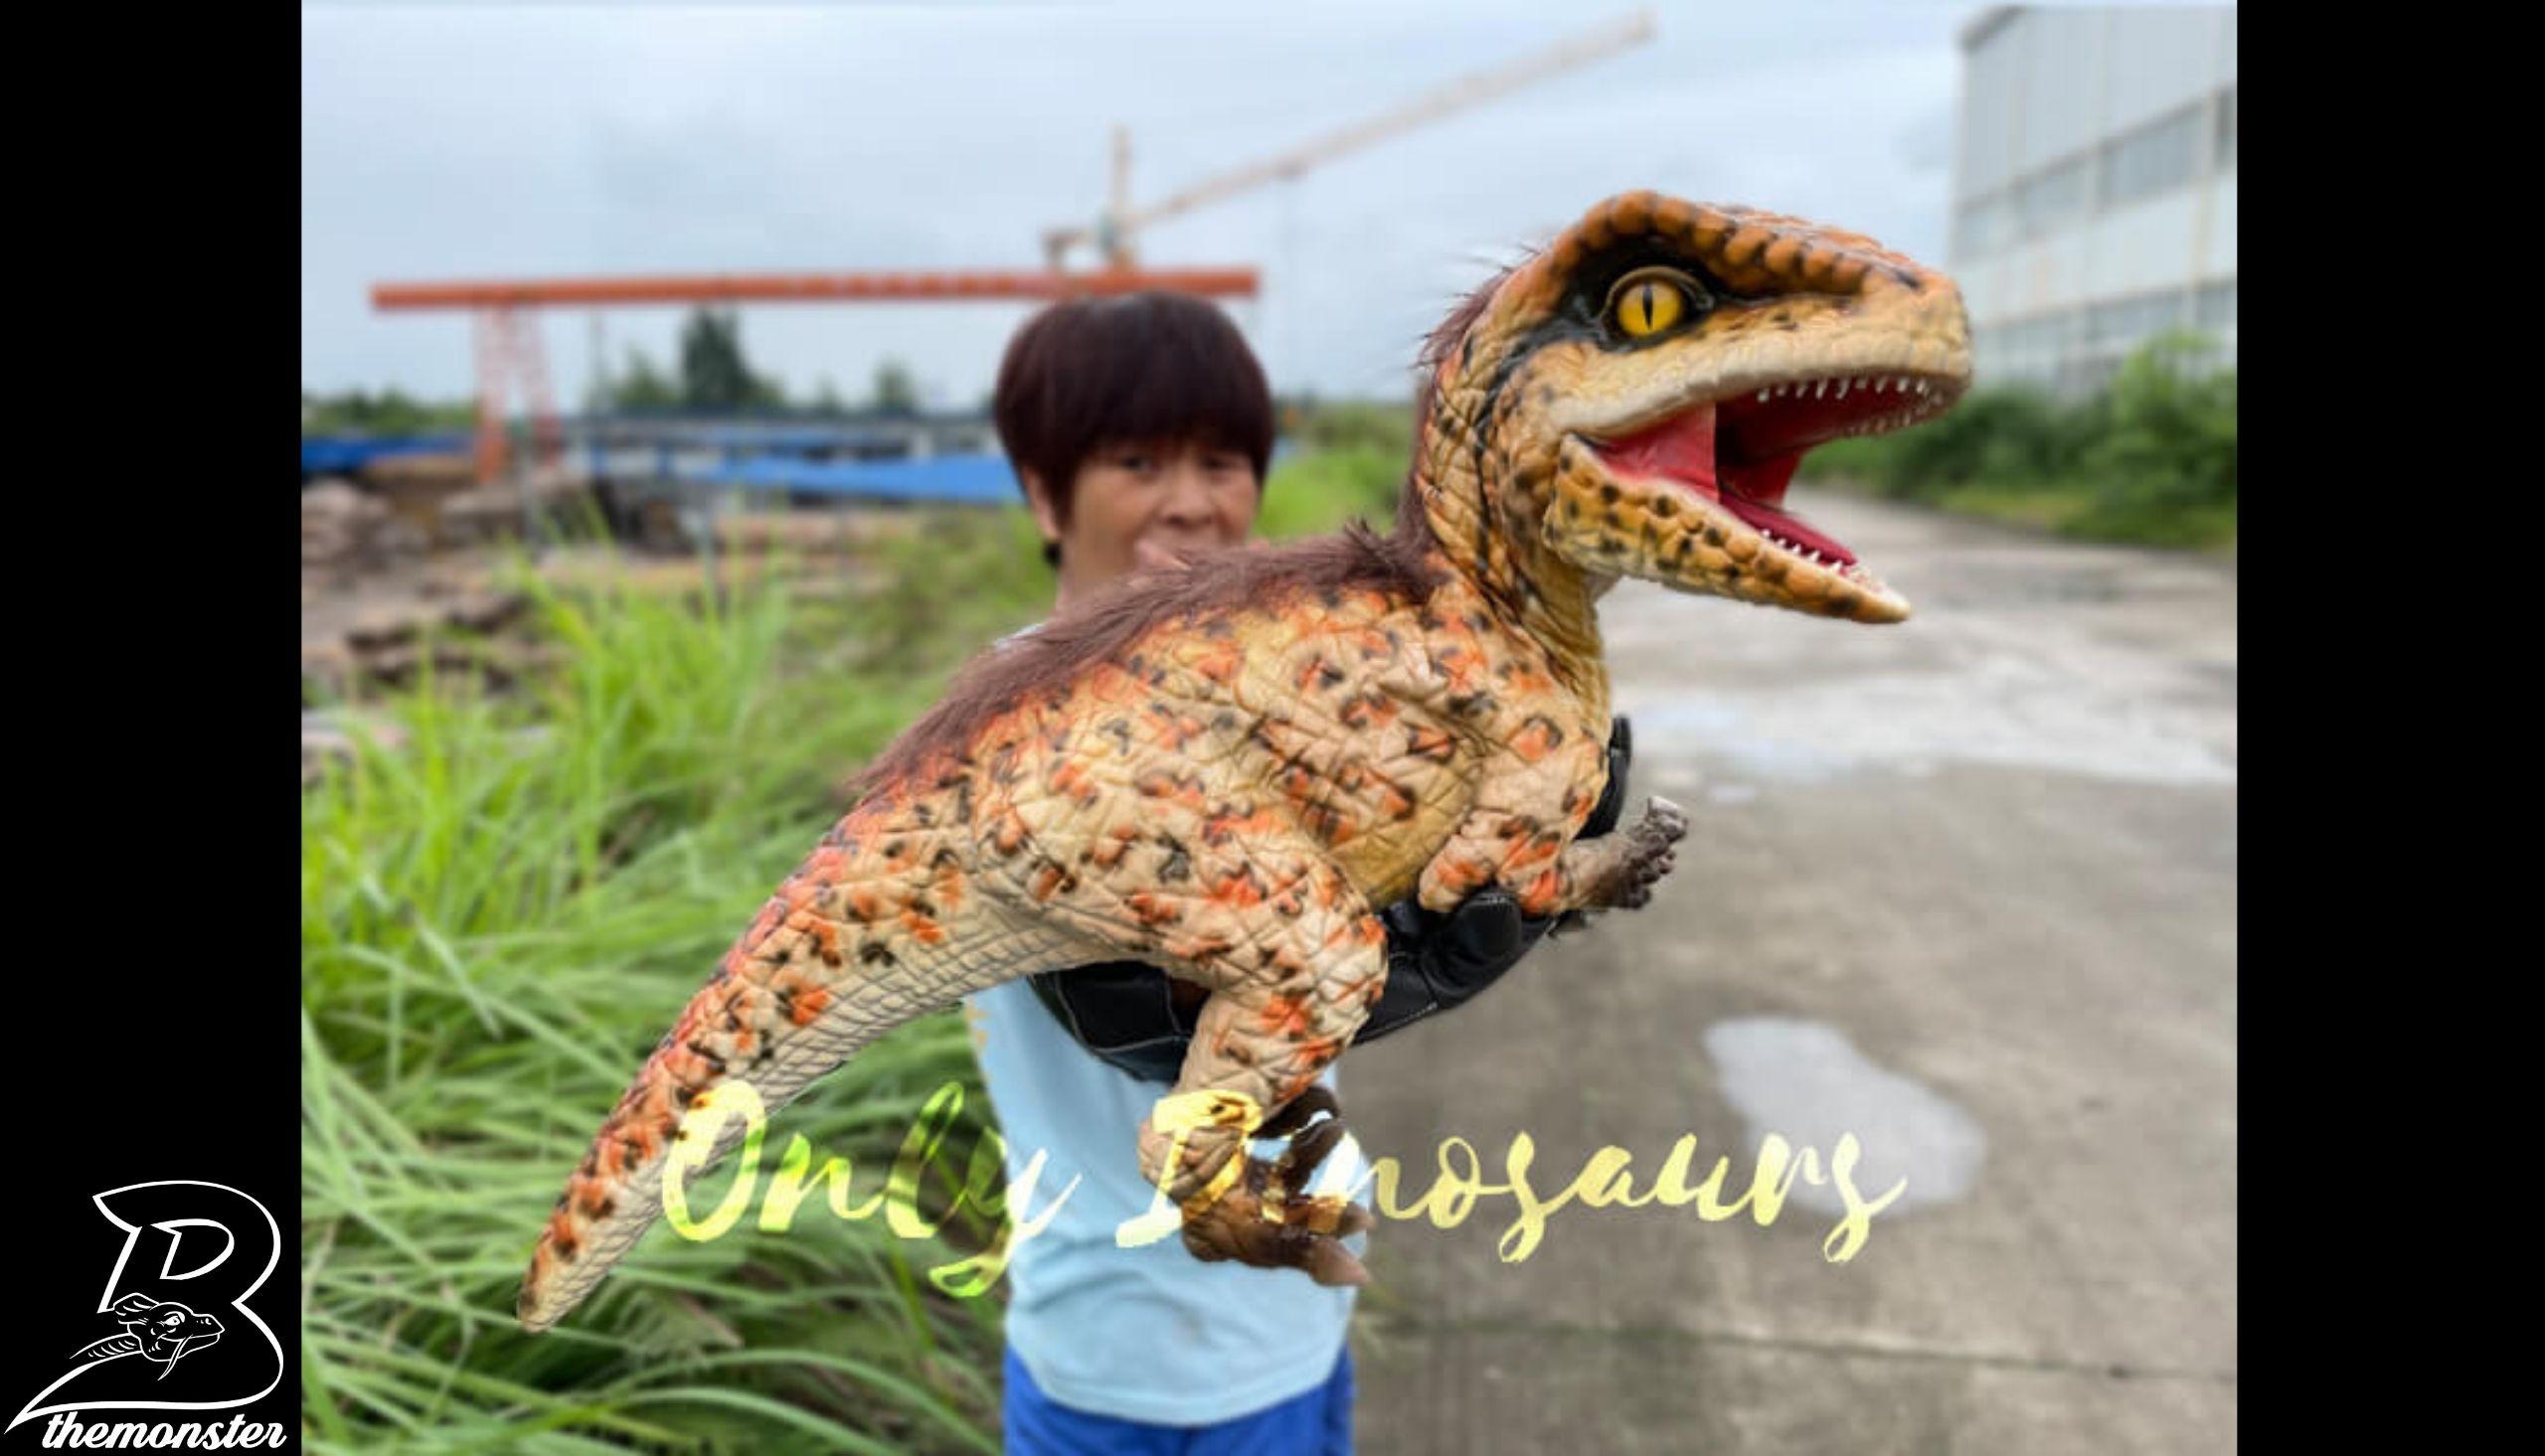 Realistic Feathered Raptor False Arm Puppet in vendita sul Bthemonster.com